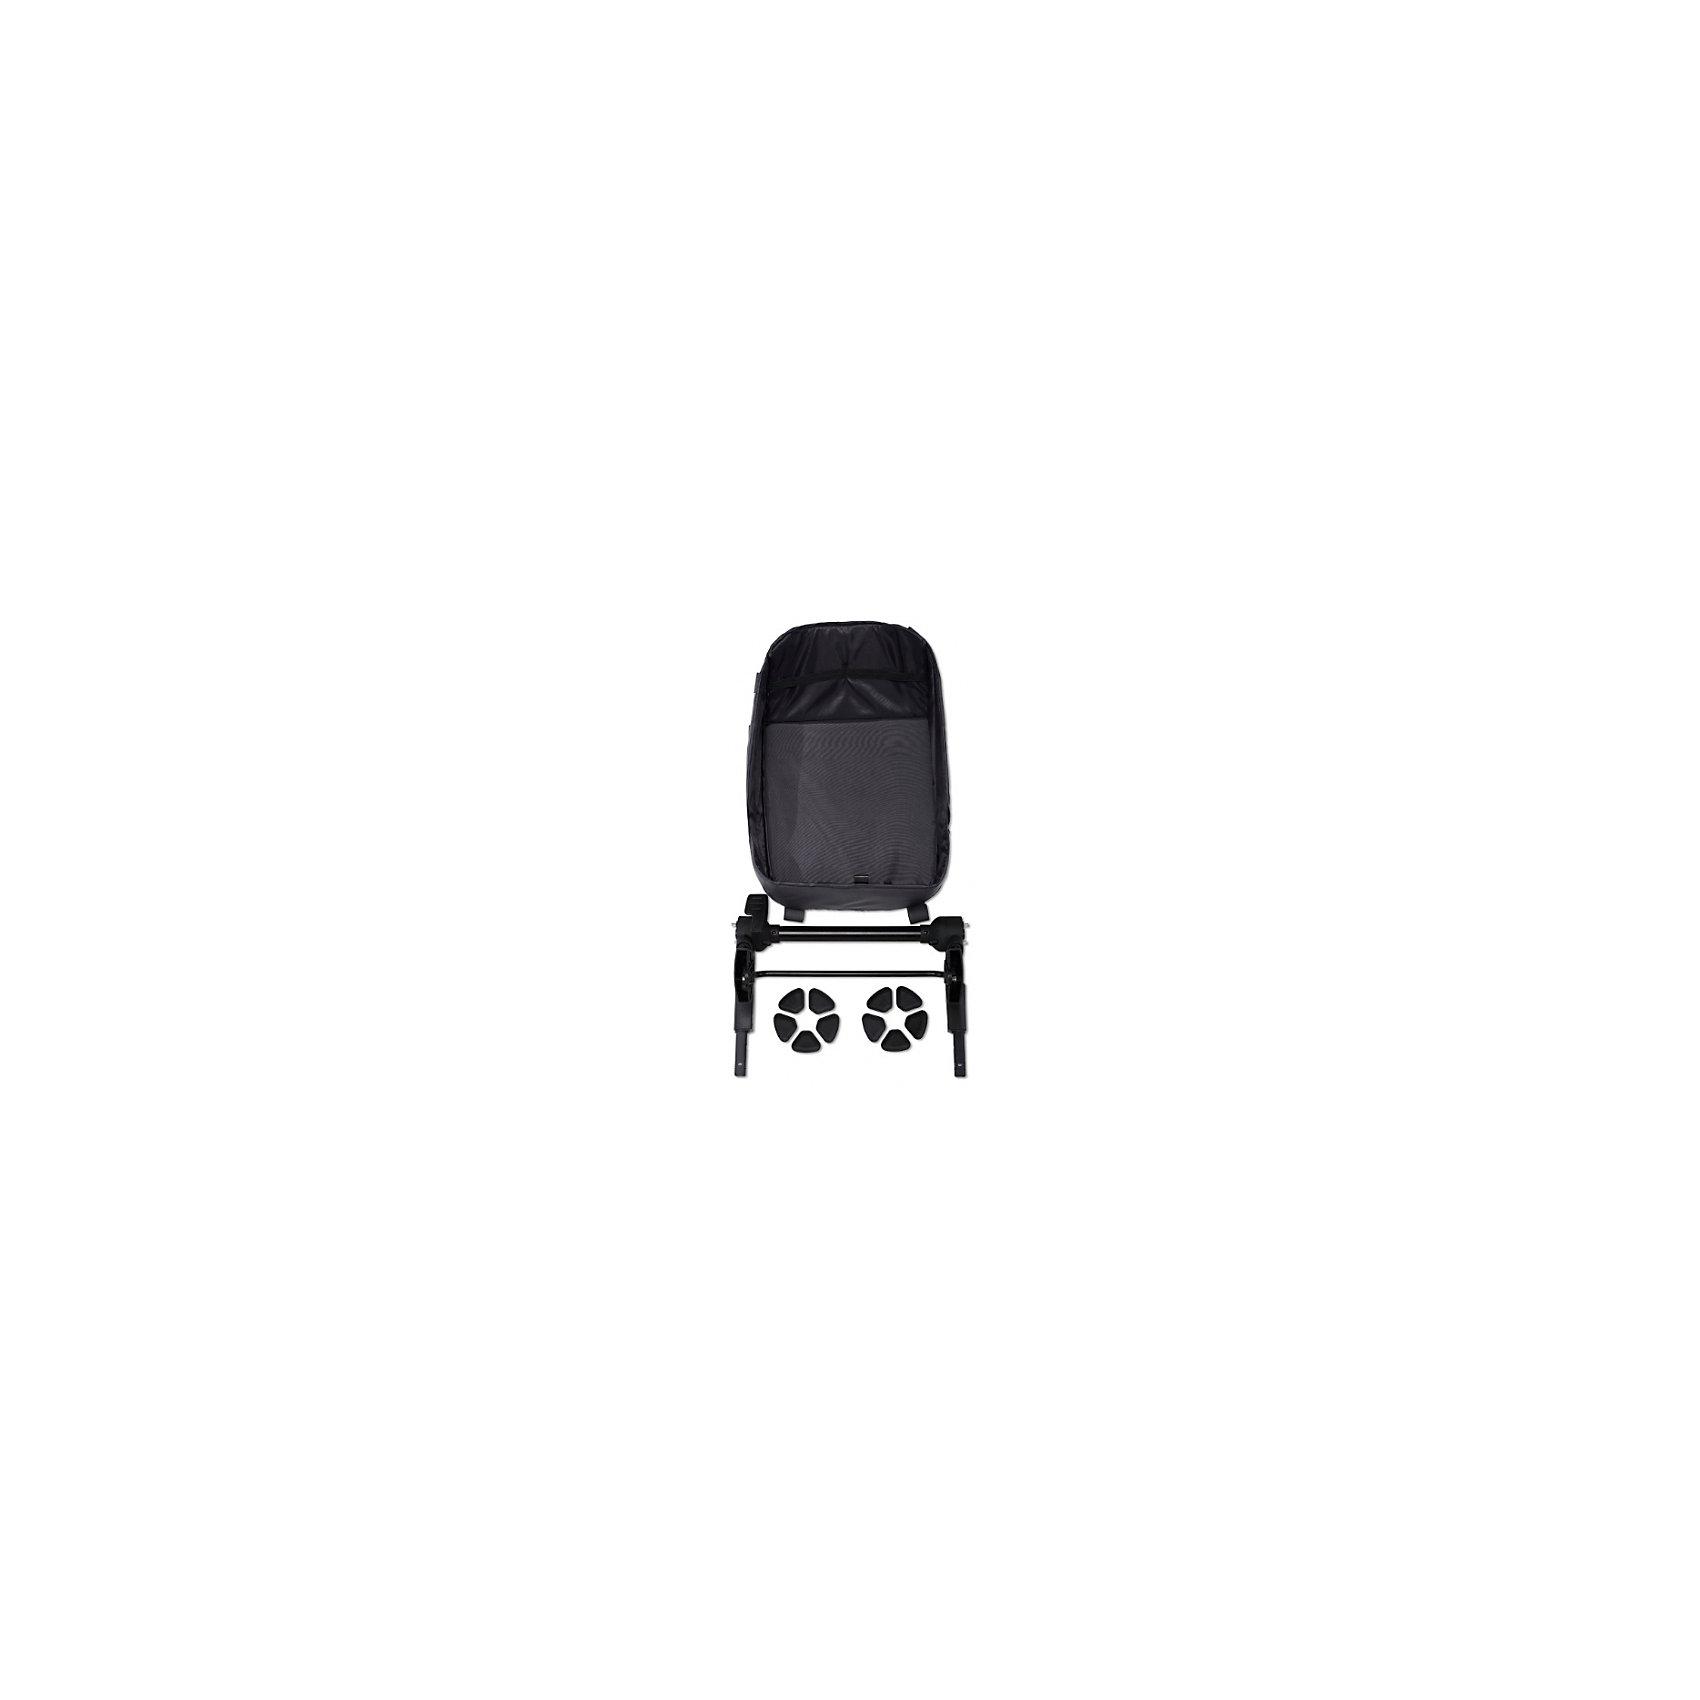 Адаптер для коляски Harvey, EasywalkerАксессуары для колясок<br>EHA10201 Адаптер Easywalker Harvey Extension Set<br><br>Ширина мм: 500<br>Глубина мм: 200<br>Высота мм: 400<br>Вес г: 3300<br>Возраст от месяцев: -2147483648<br>Возраст до месяцев: 2147483647<br>Пол: Унисекс<br>Возраст: Детский<br>SKU: 5613123